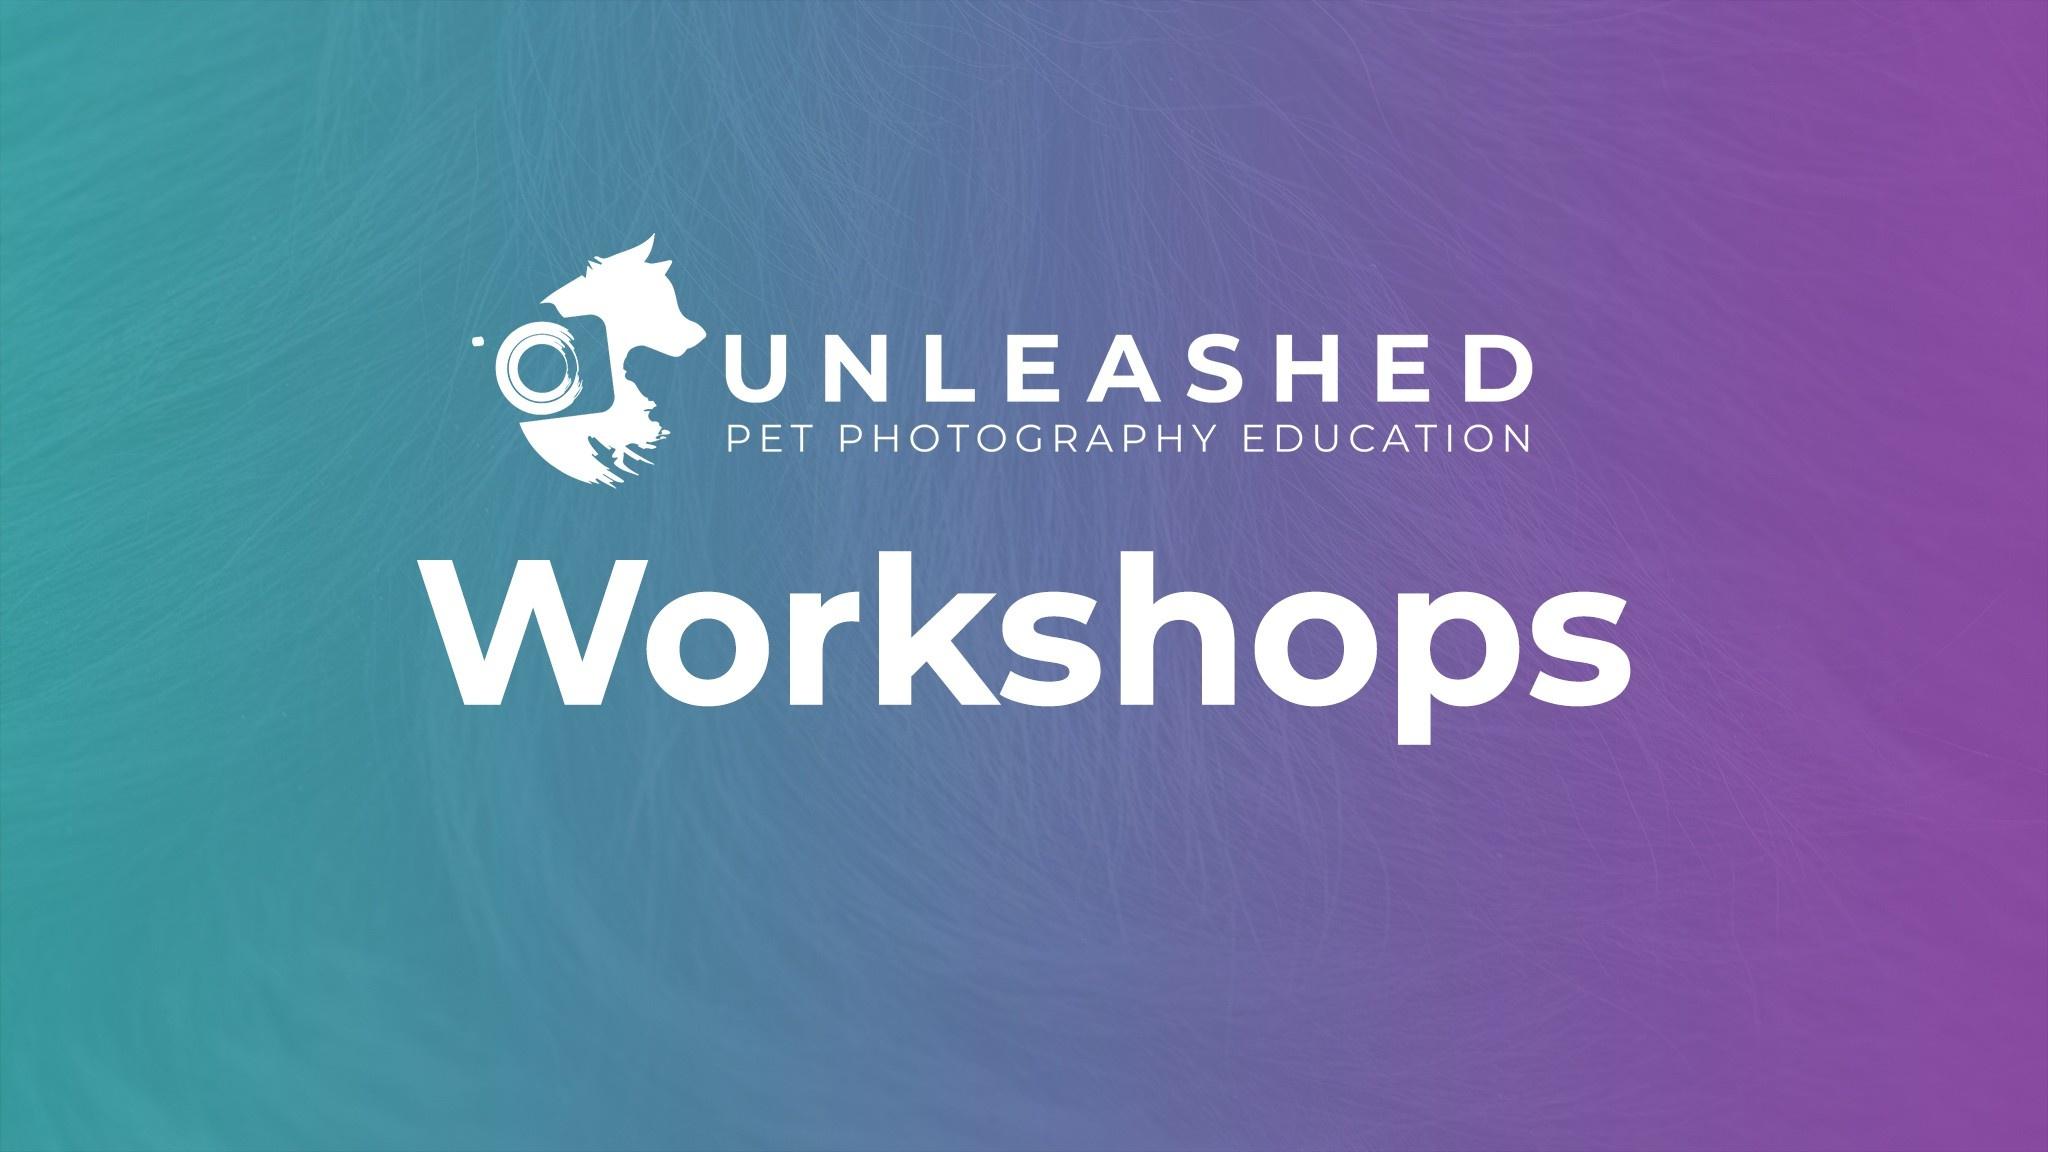 Premium Pet Photography Workshops and Retreats